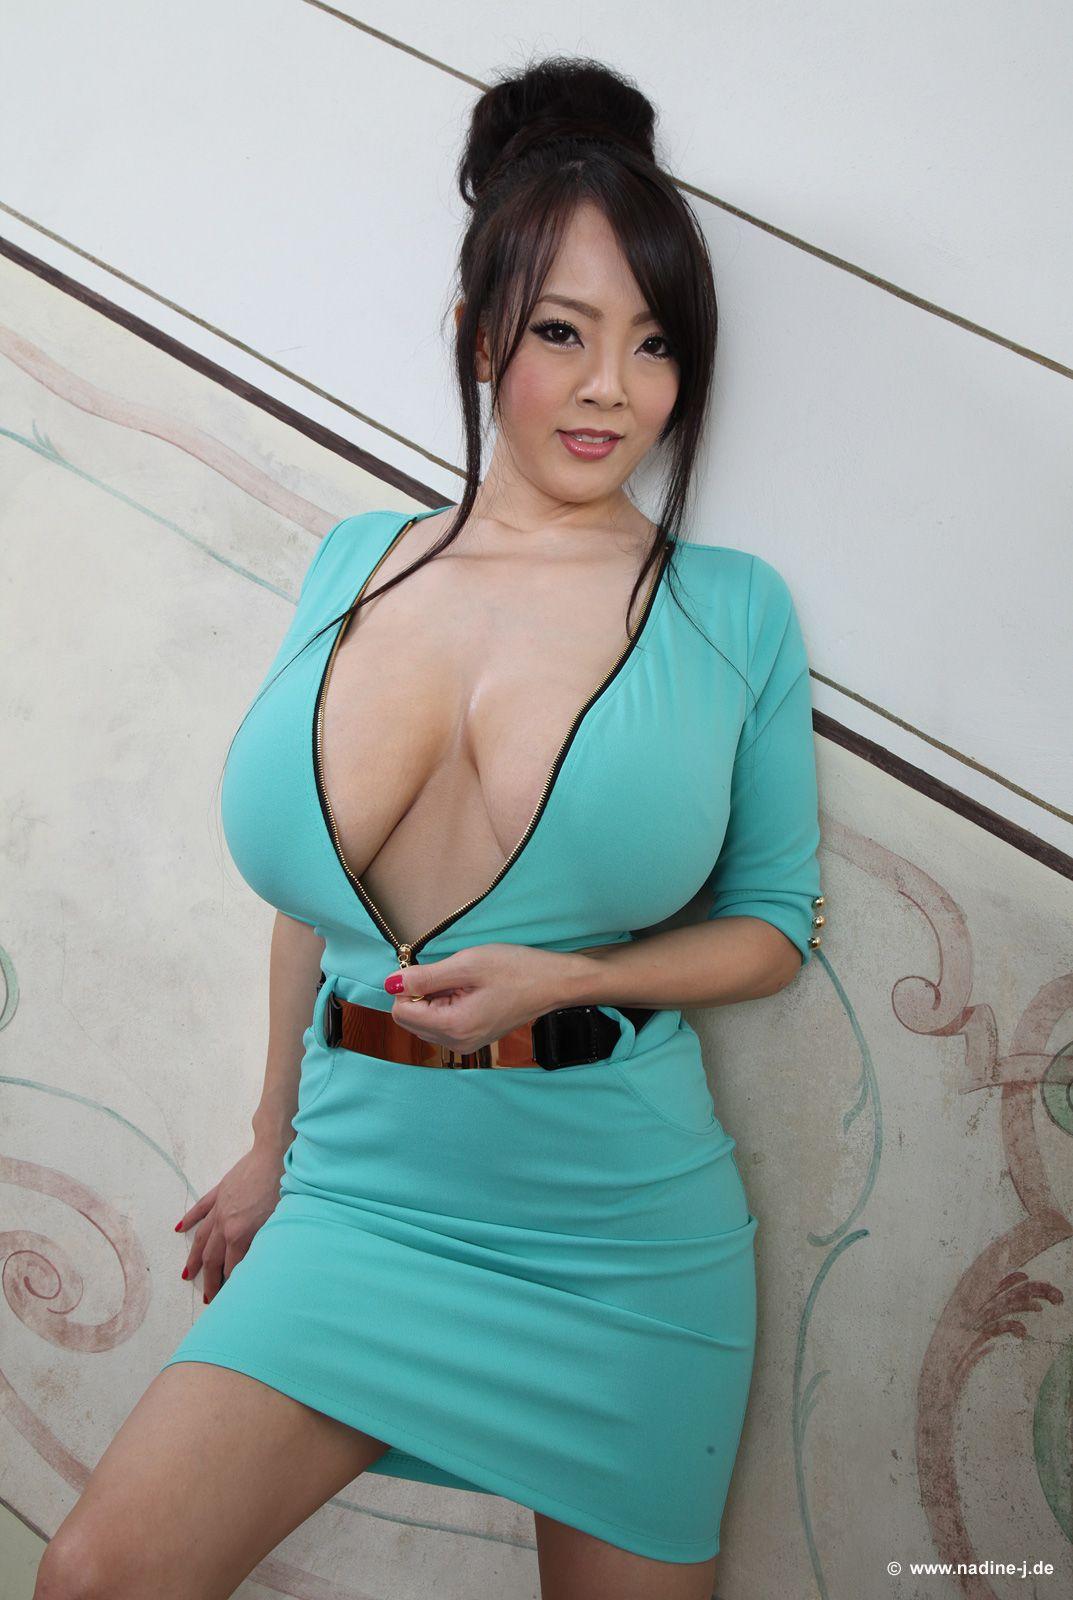 hitomi tanaka blauen kleid